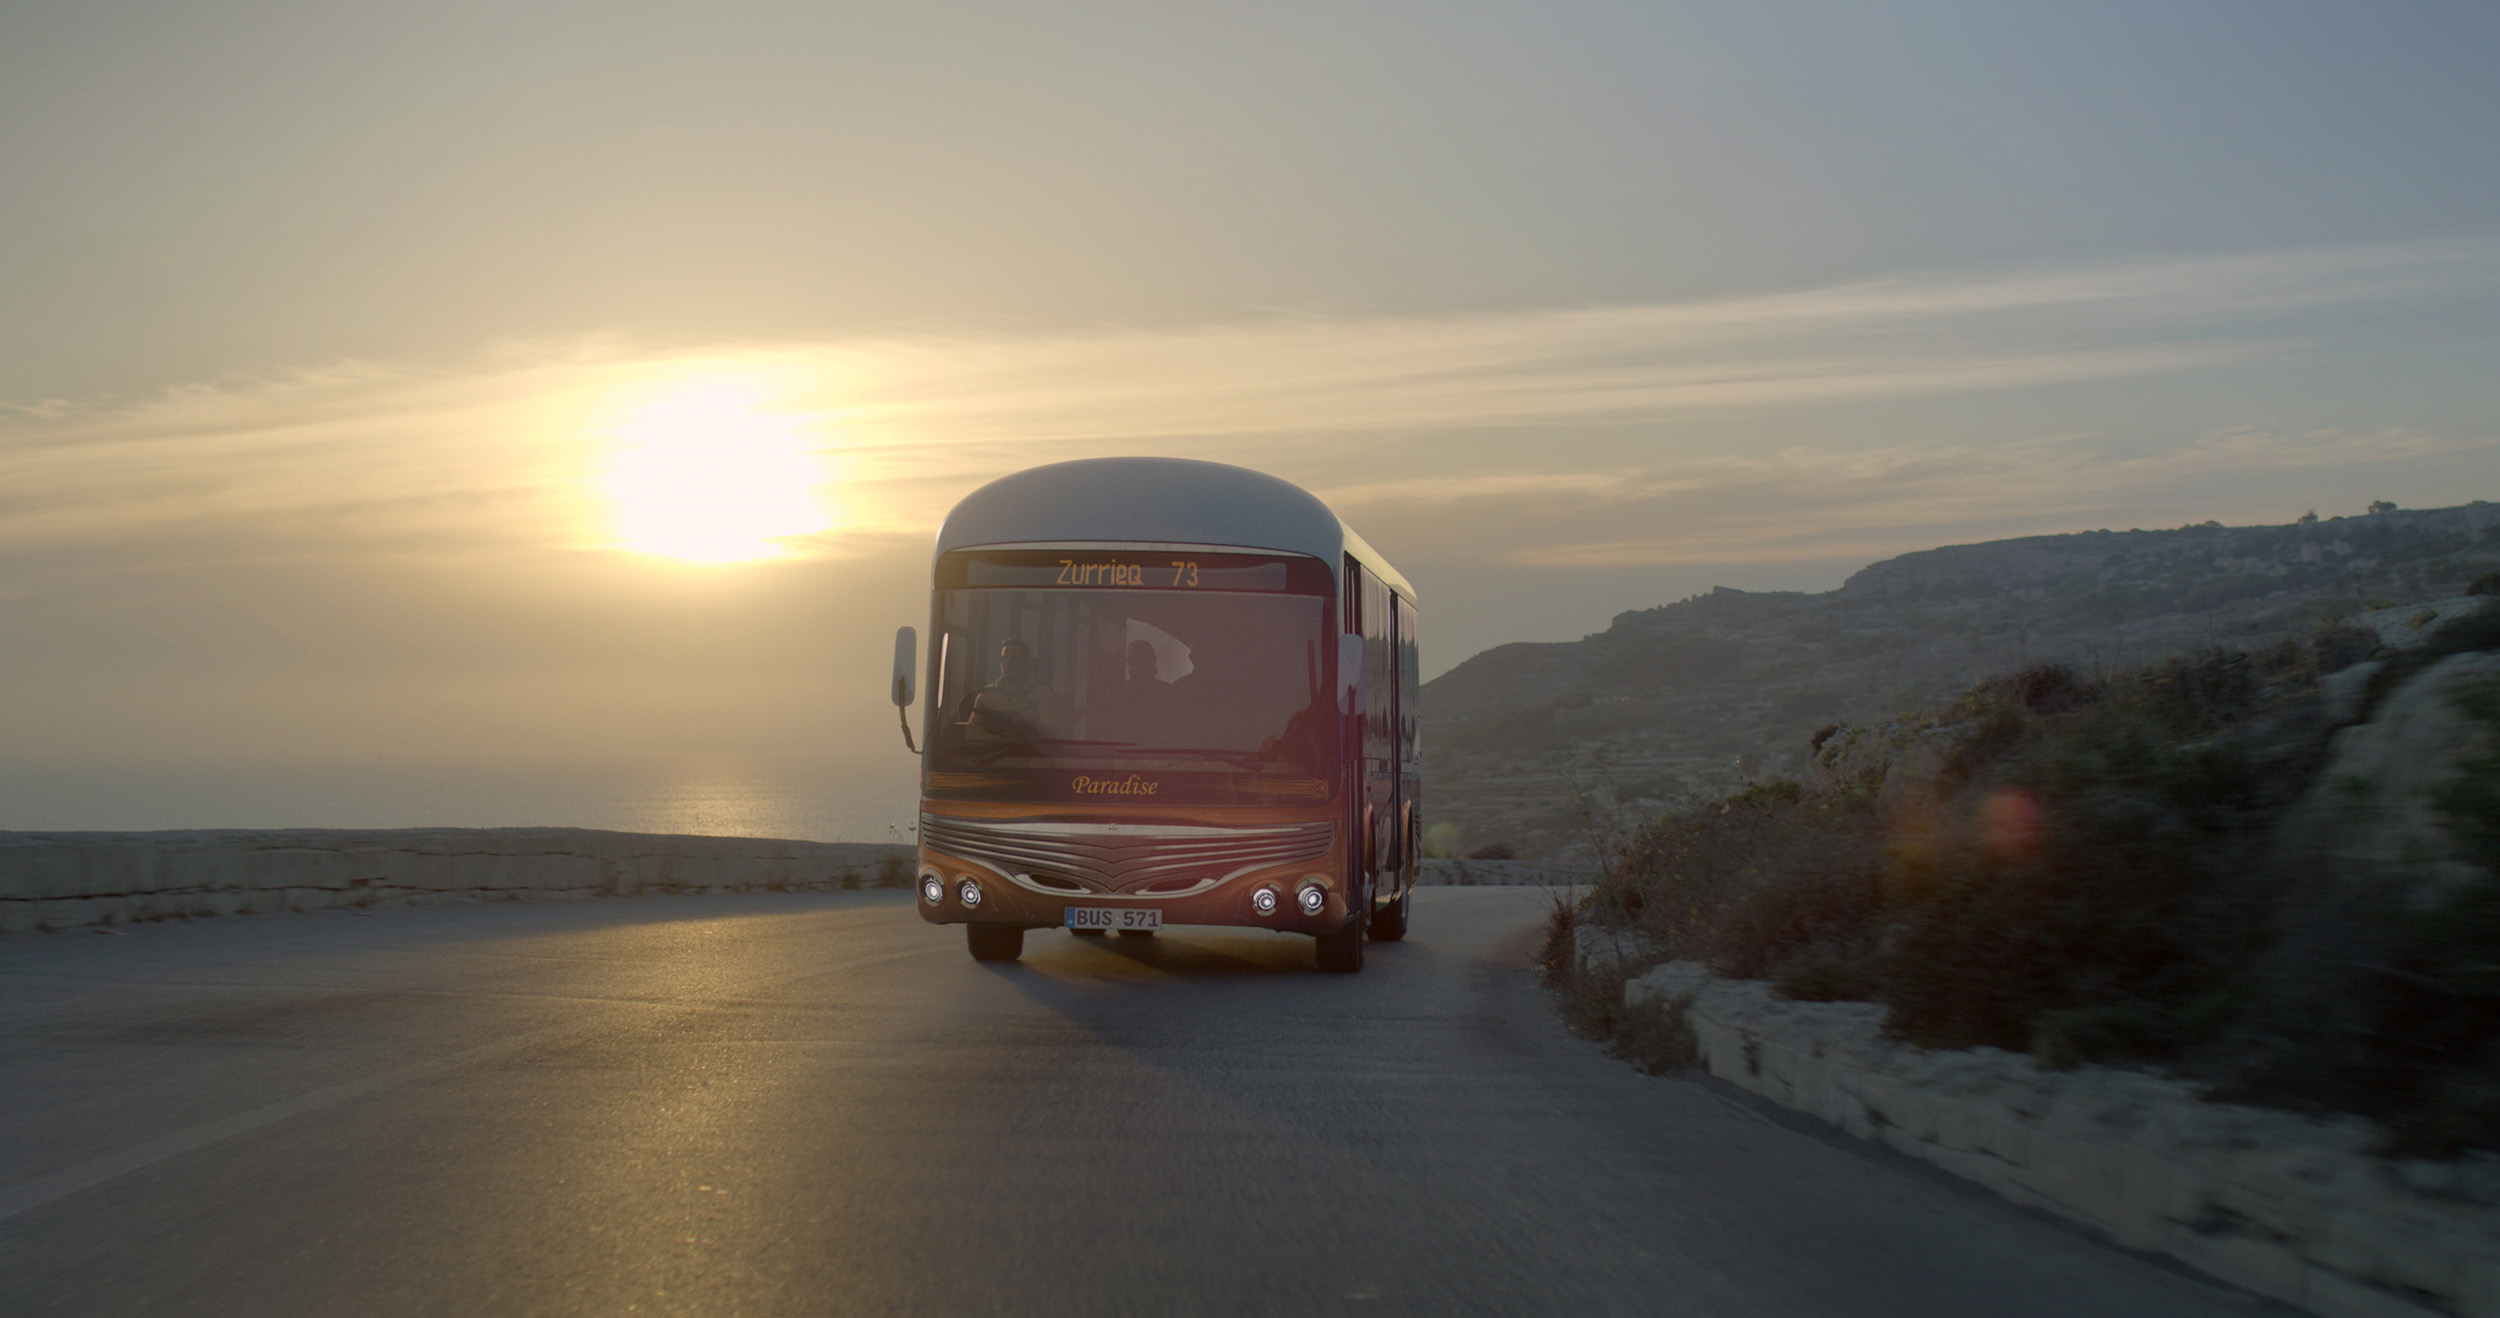 Visualisation_05_Mizzi Studio_Malta Bus Reborn_web.jpg